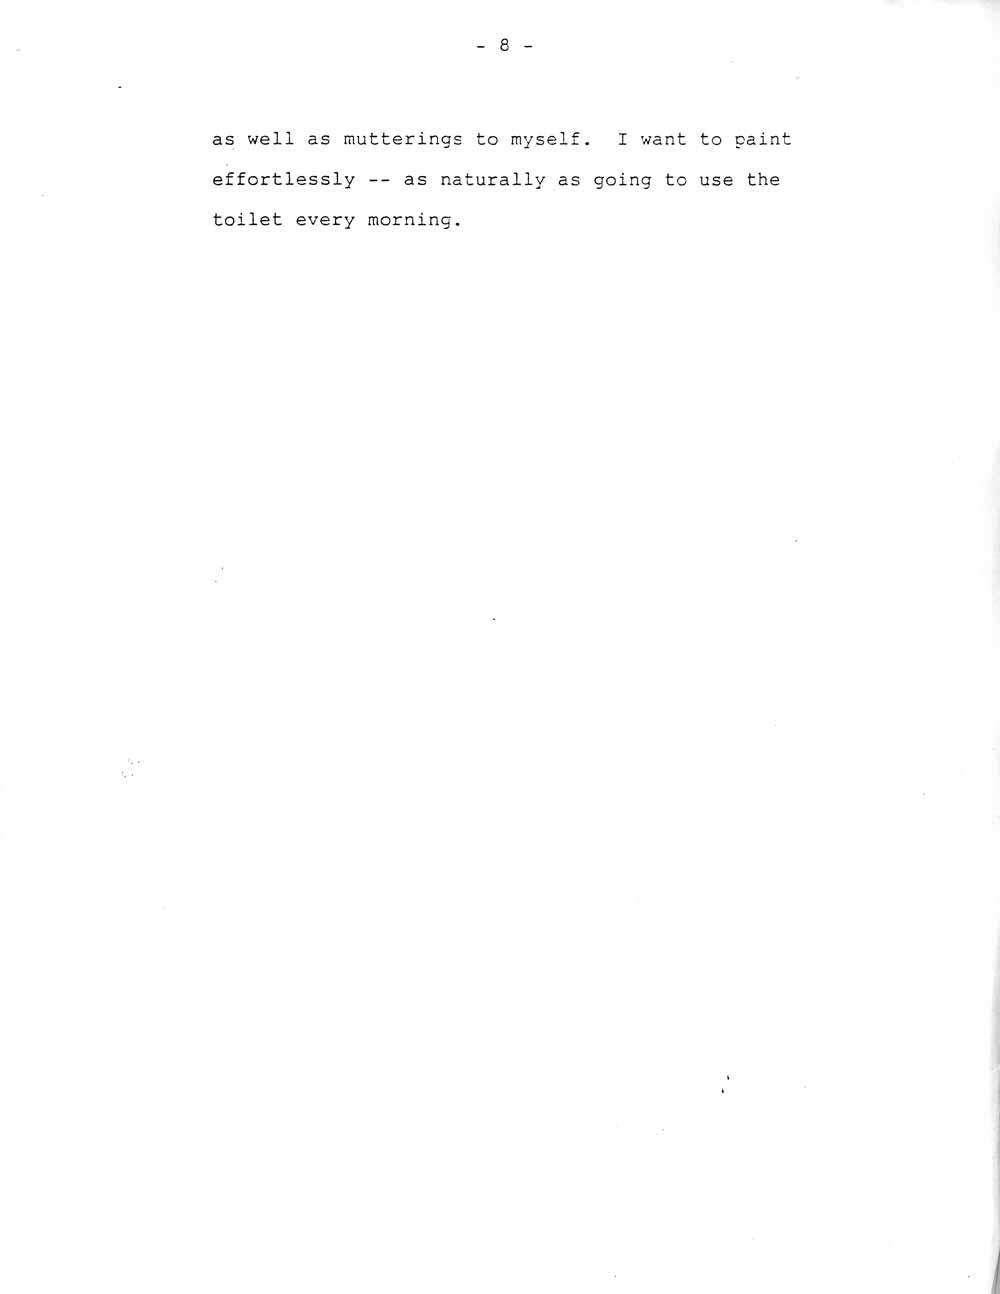 Ik-Joong Kang's Artist Statement, pg 8